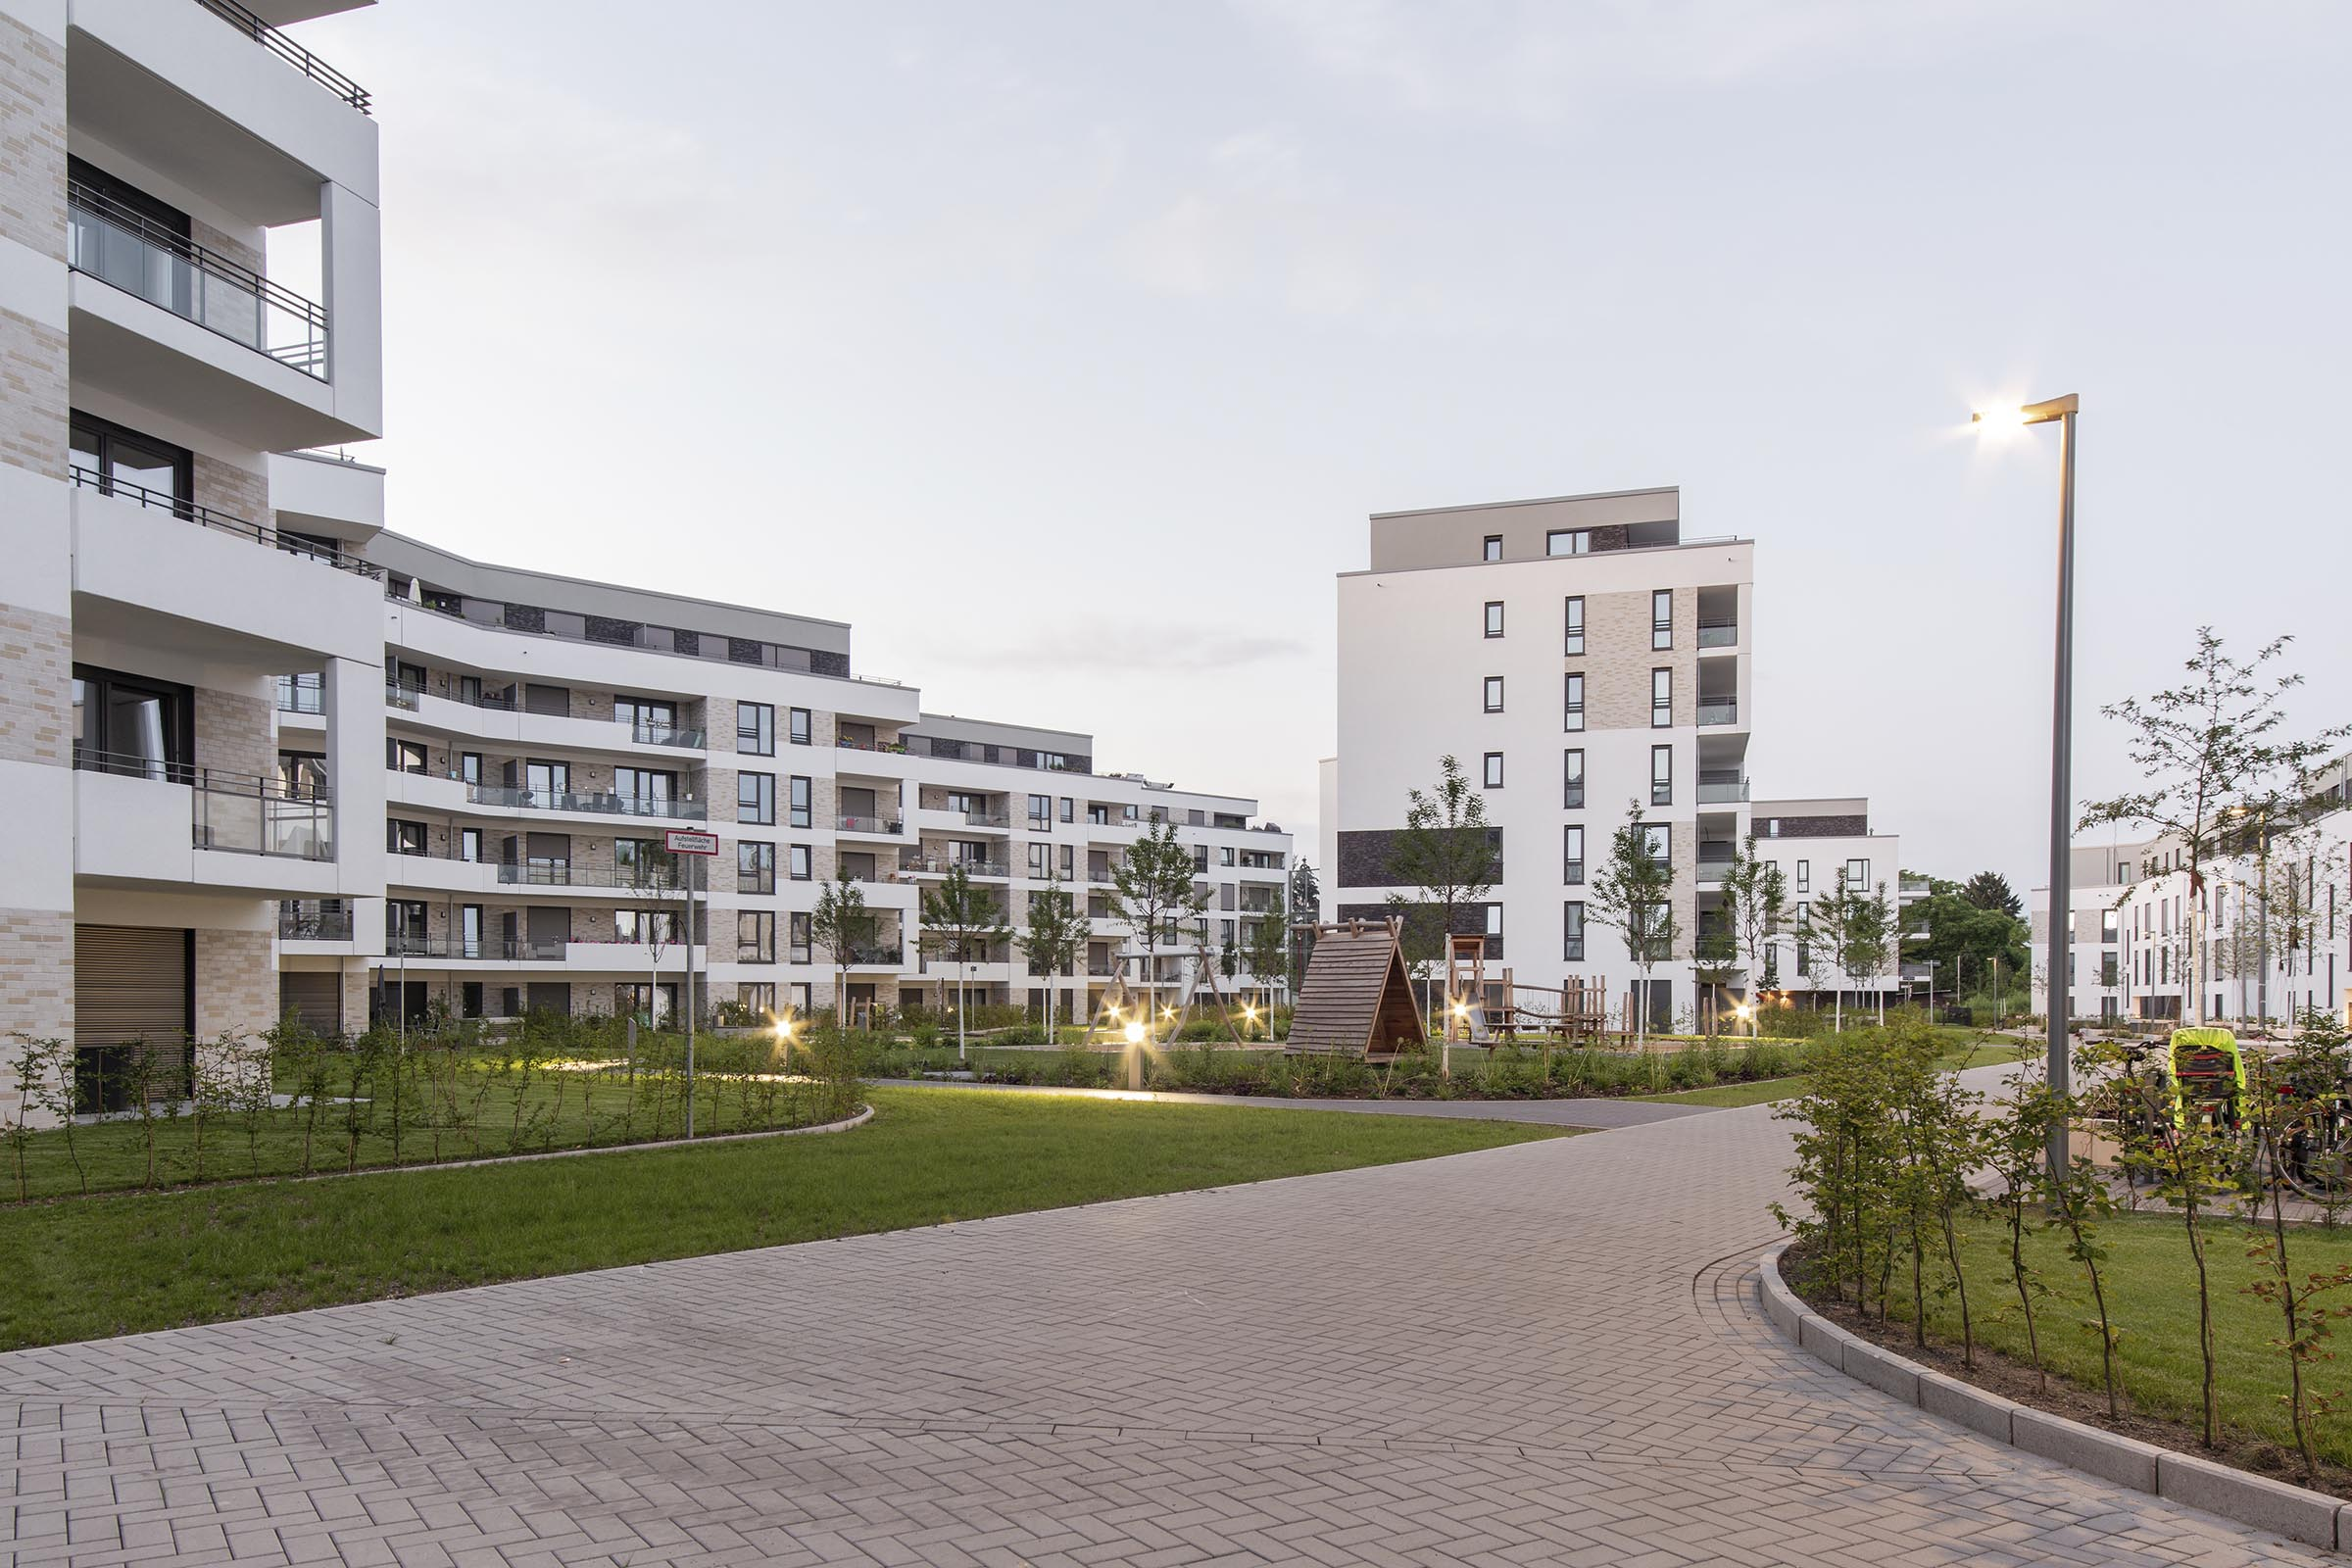 Architektur Fotos: Zechbau-Reuterbruecke-Foto-Stephen-Petrat-3966-kl